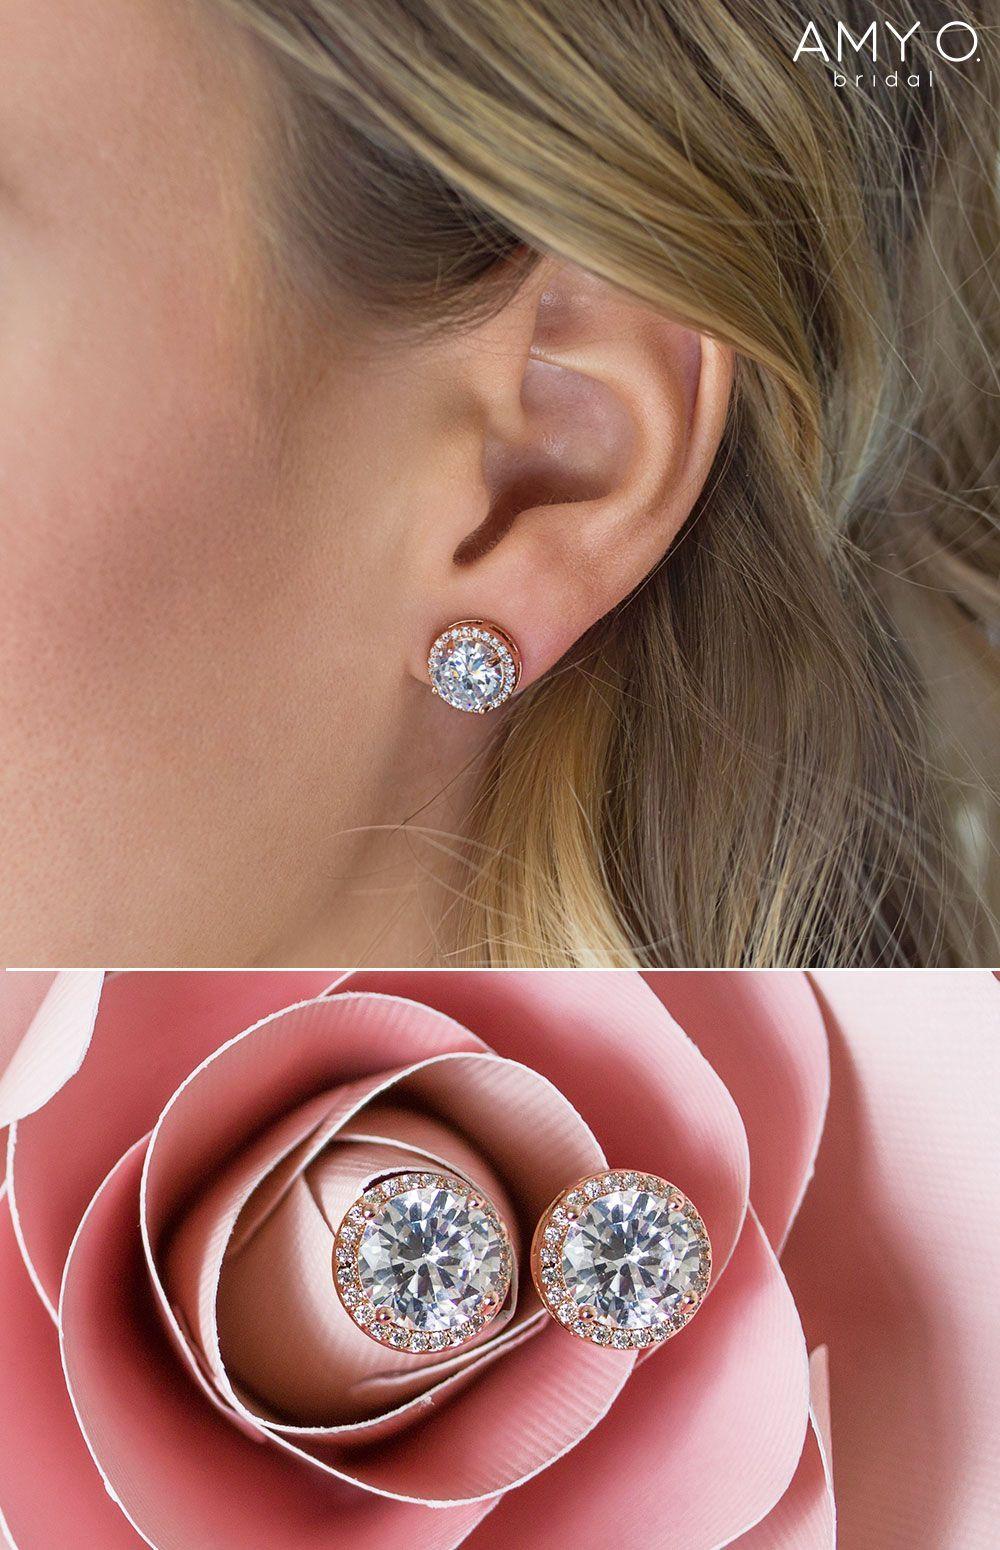 Crystal Bridal Earrings Earrings For Bride Rose Gold Earrings Clip On Earrings Wedding Day Earrings In 2020 Bridal Earrings Studs Big Stud Earrings Bride Earrings